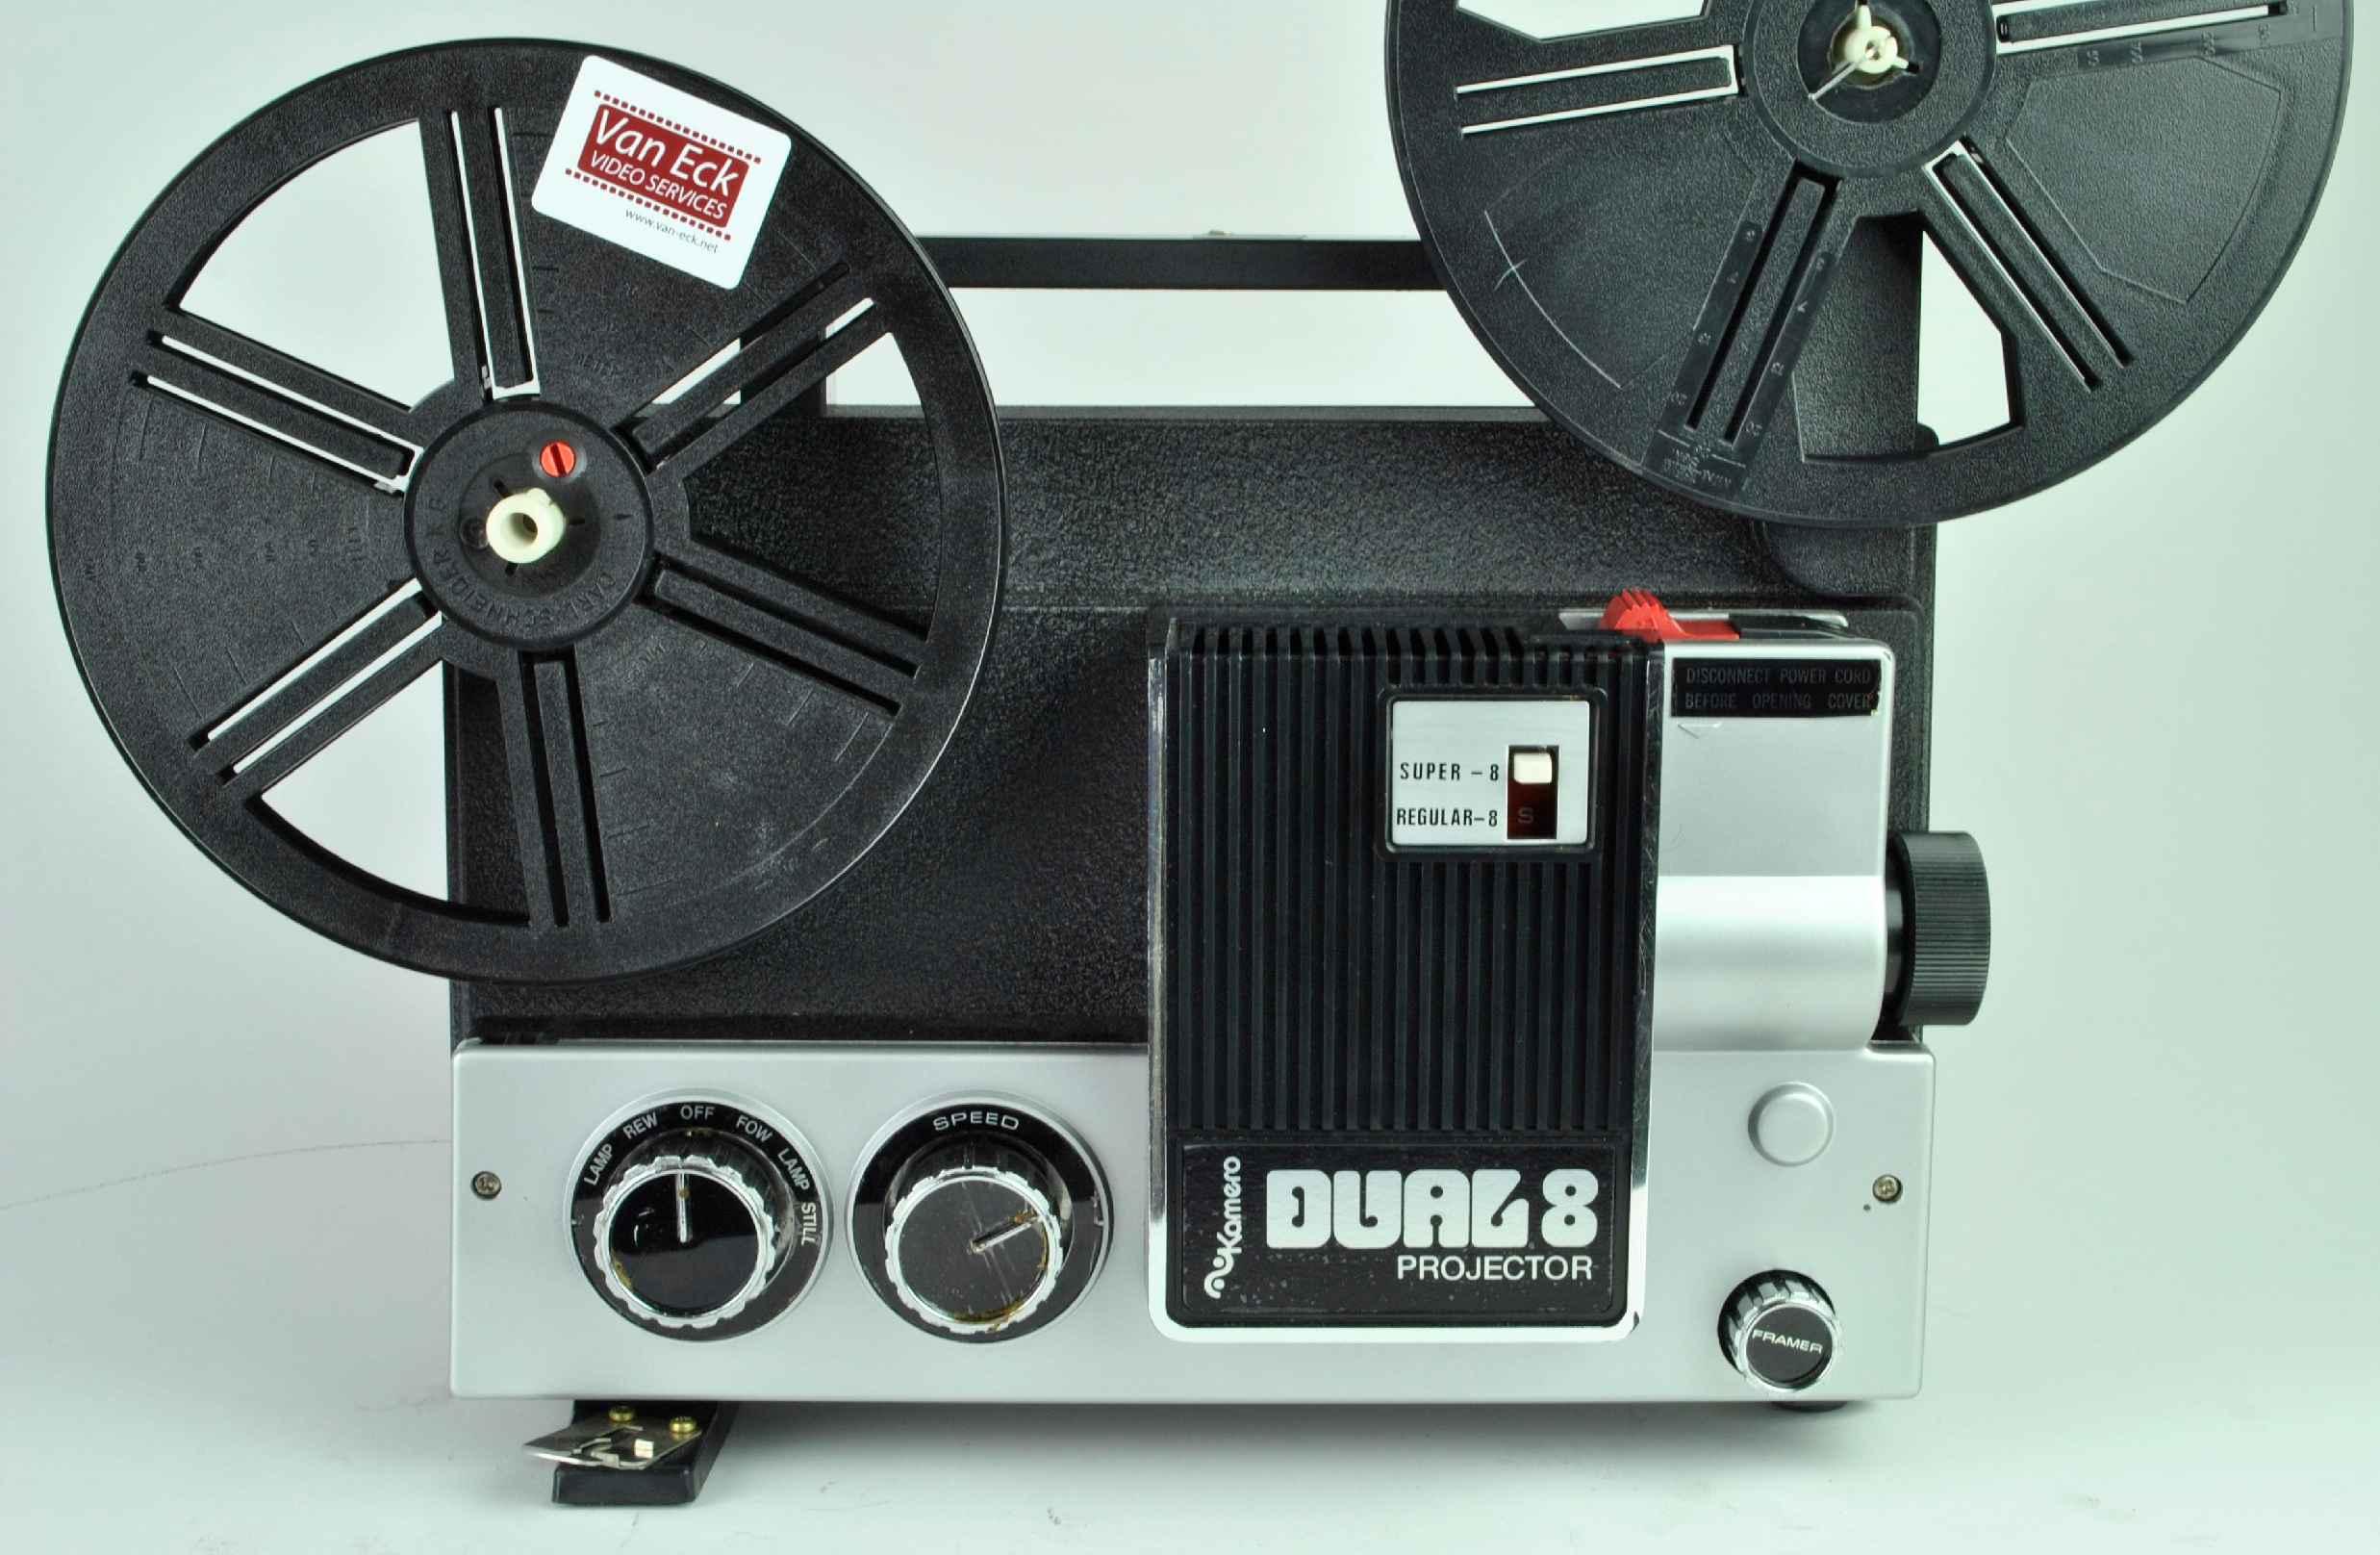 Kamero Dual 8 Projector, Film Projectors - Spare Parts and